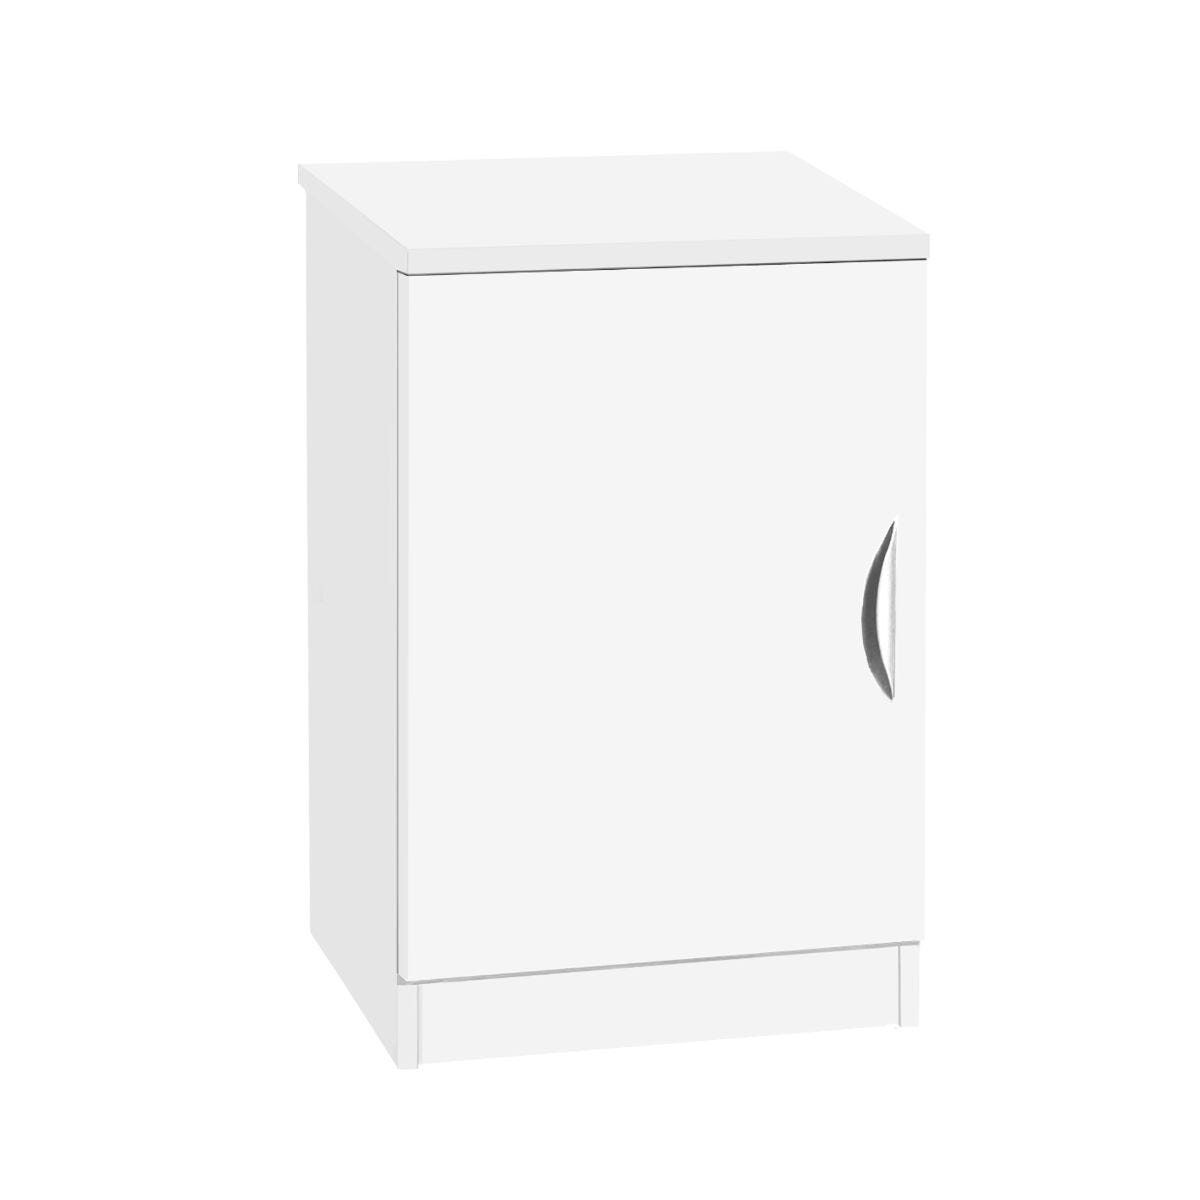 R White Desk Height Wide Cupboard 48cm White Satin